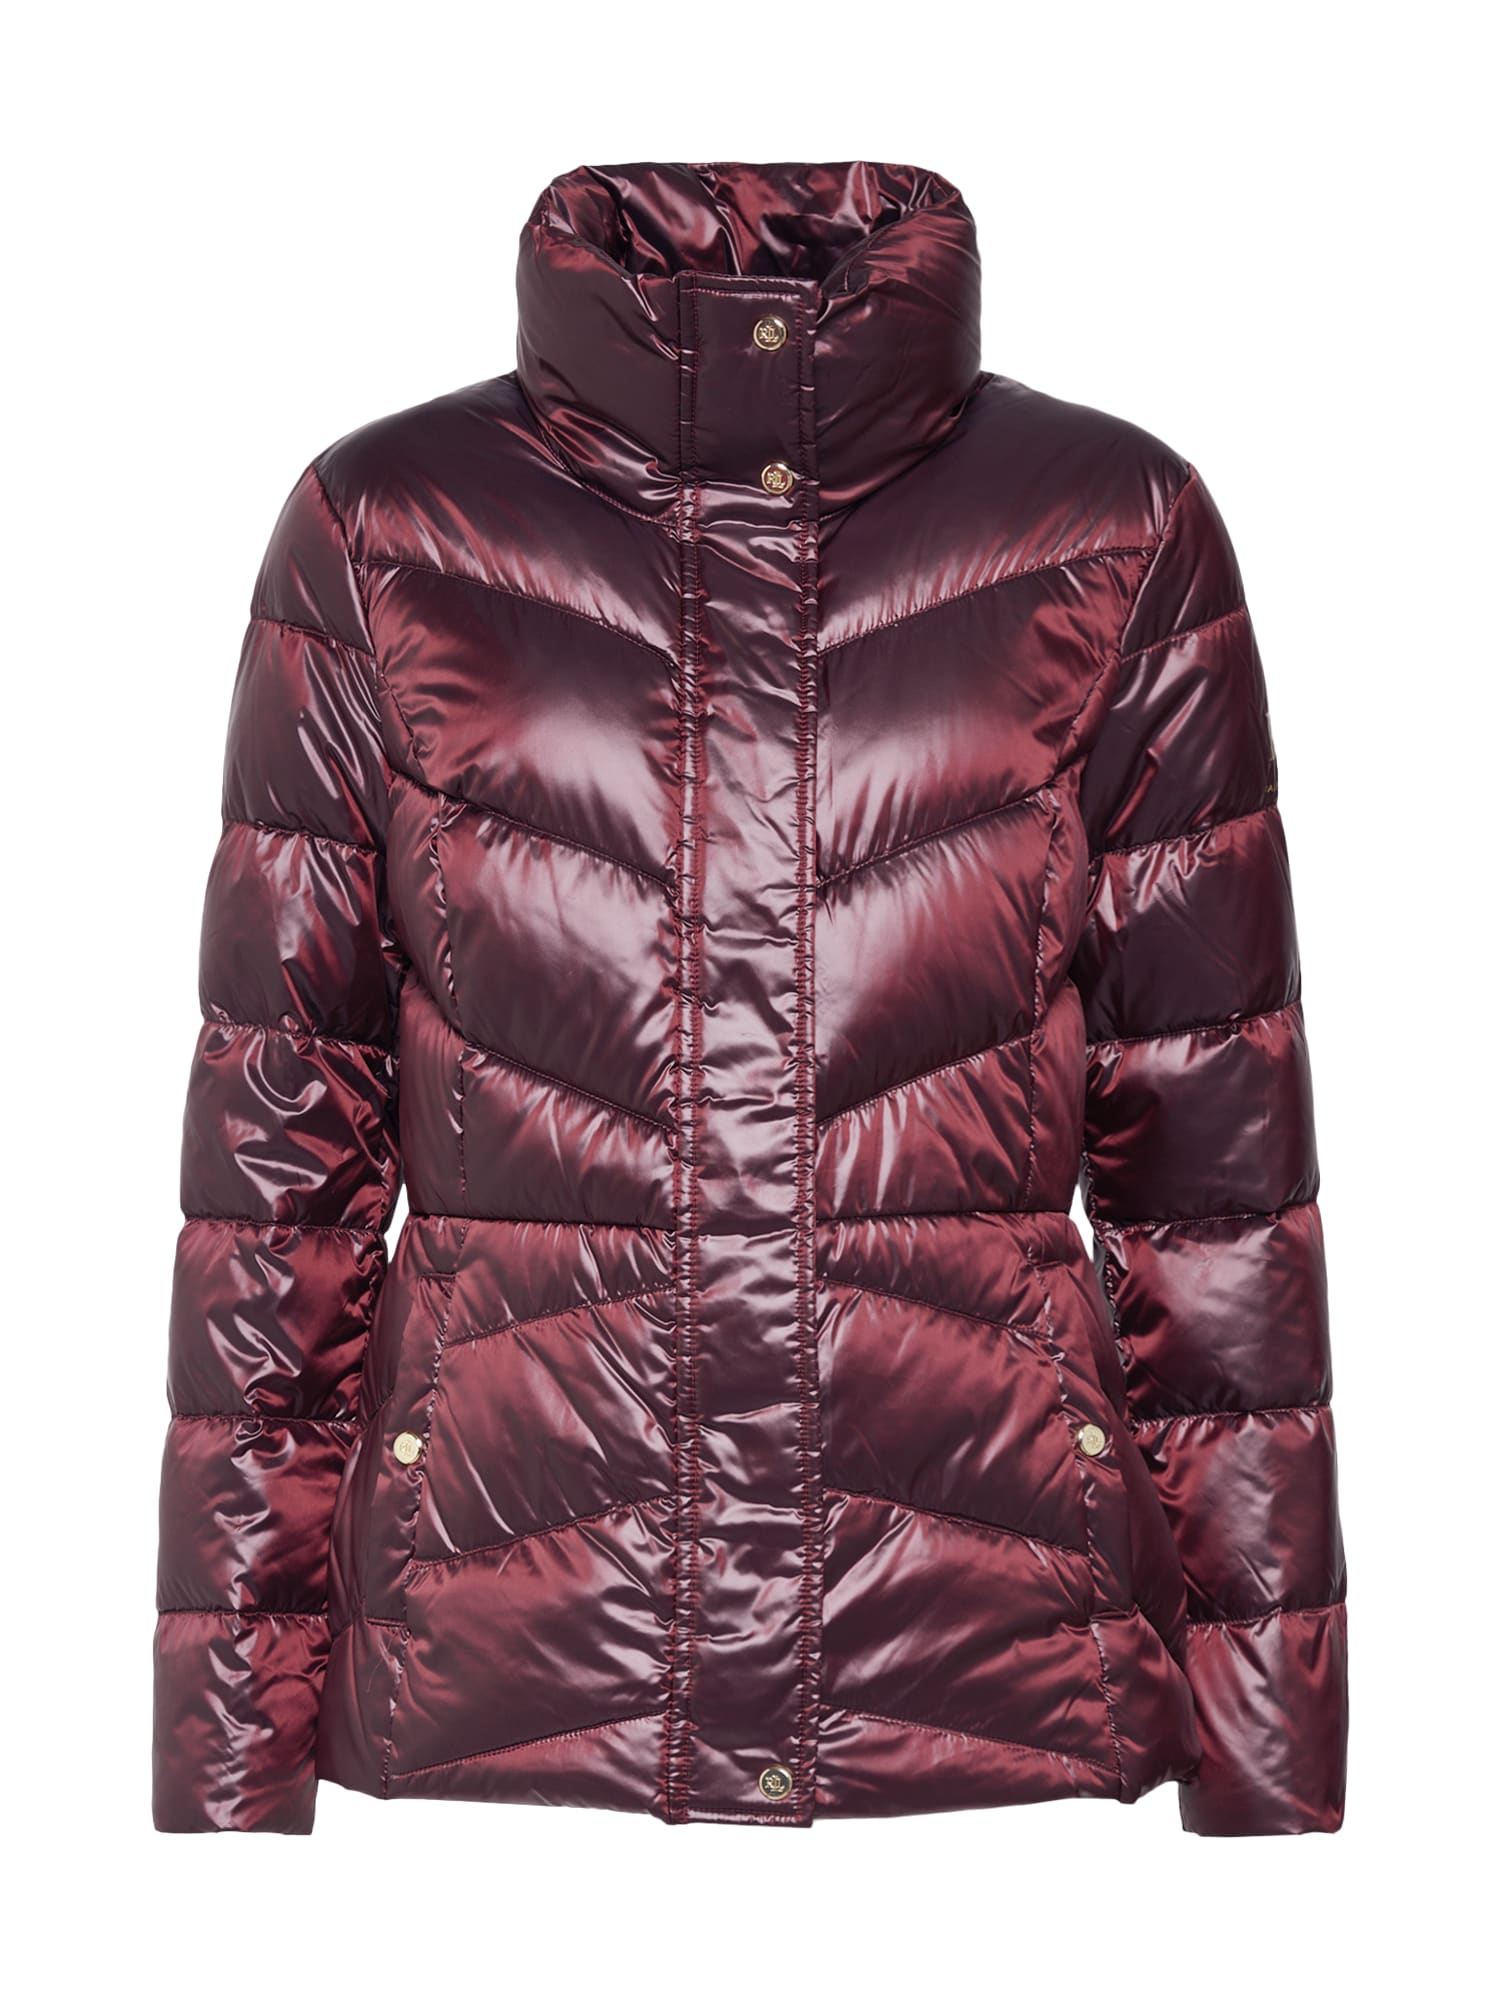 Přechodná bunda MTL PACKABLE-JACKET vínově červená Lauren Ralph Lauren